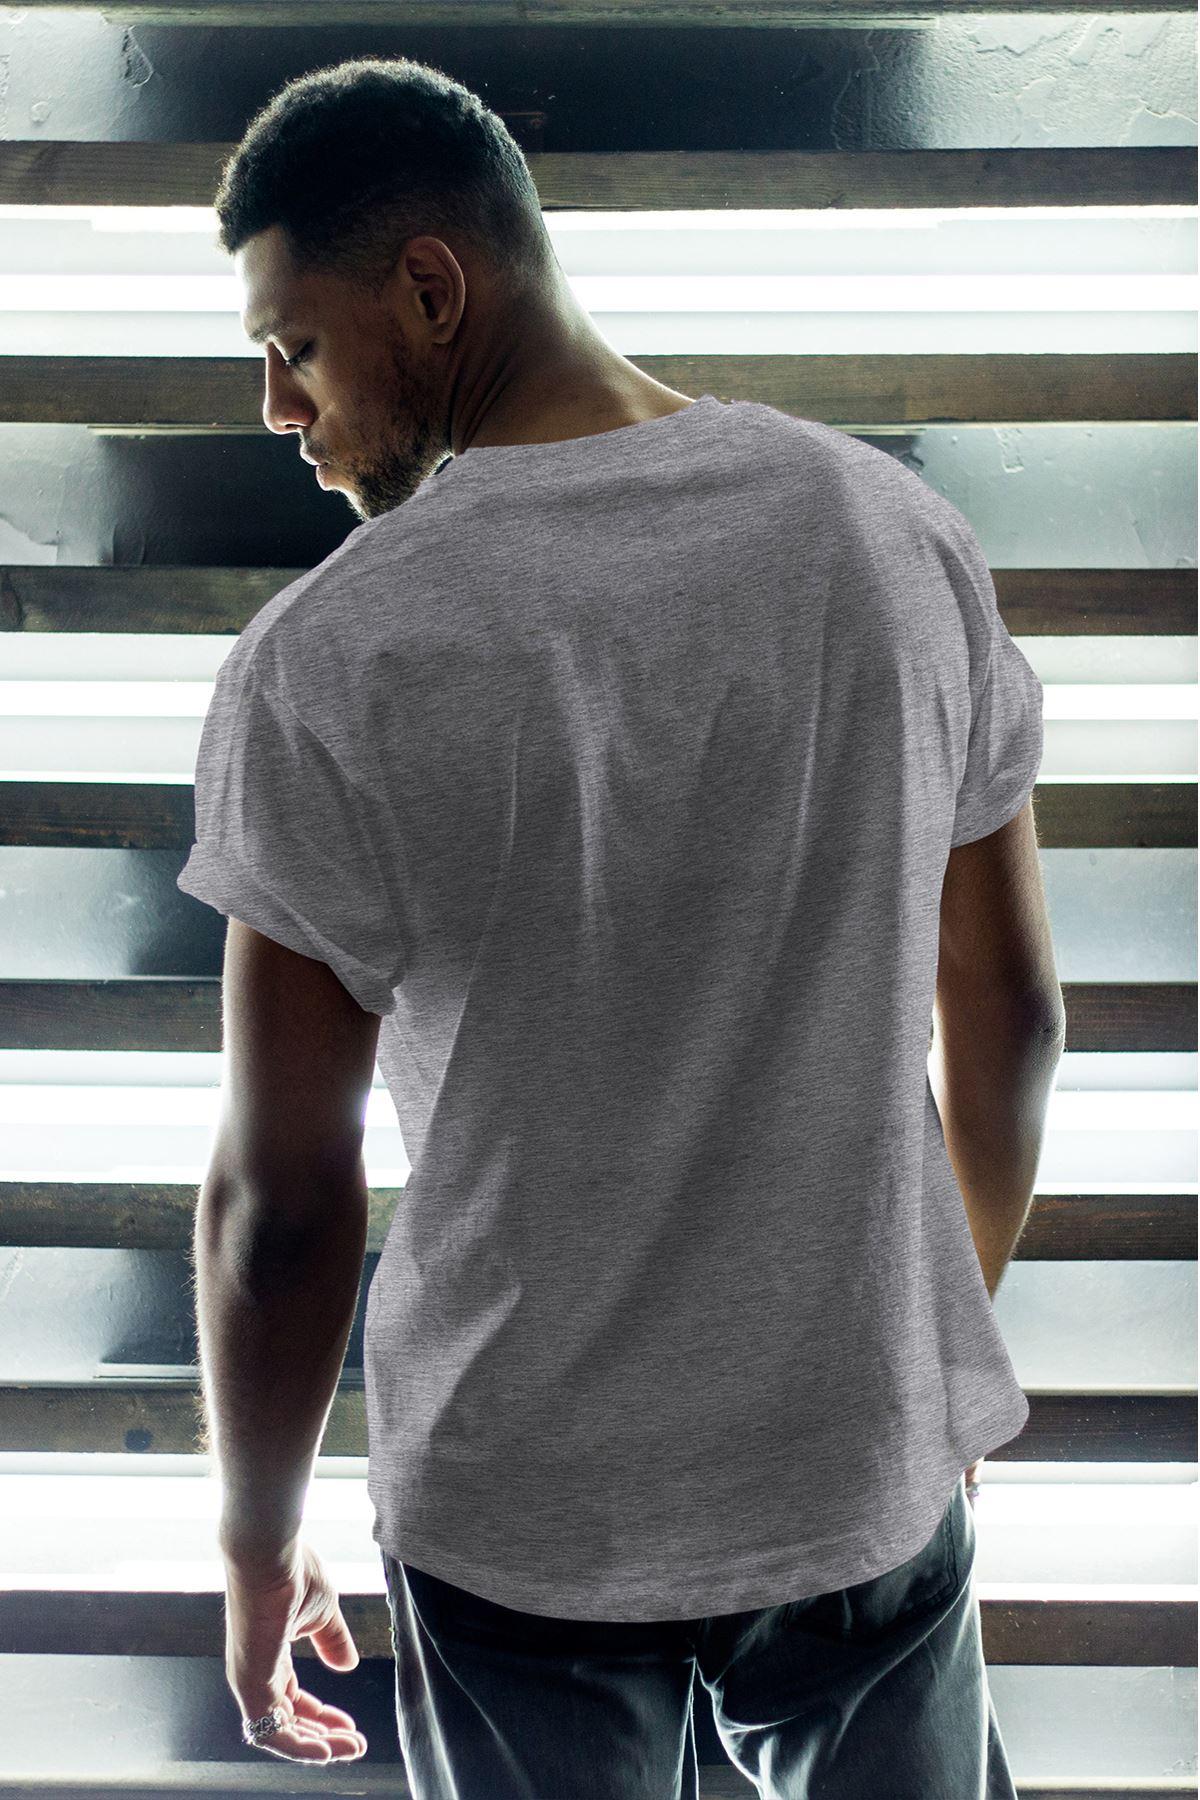 Boston Celtics 27 Gri Erkek Oversize Tshirt - Tişört